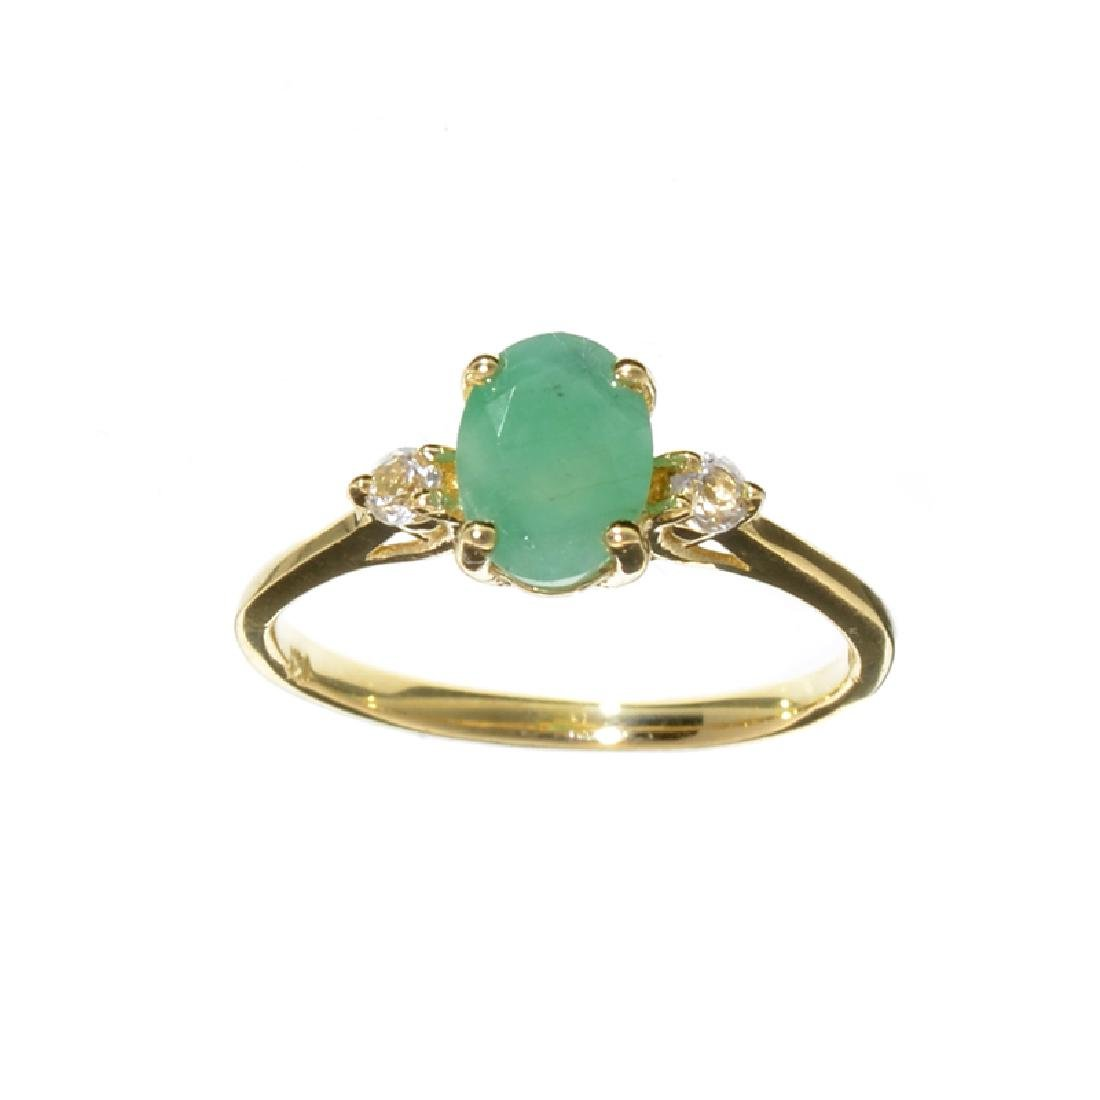 APP: 1k Fine Jewelry 14 KT Gold, 1.27CT Green Emerald